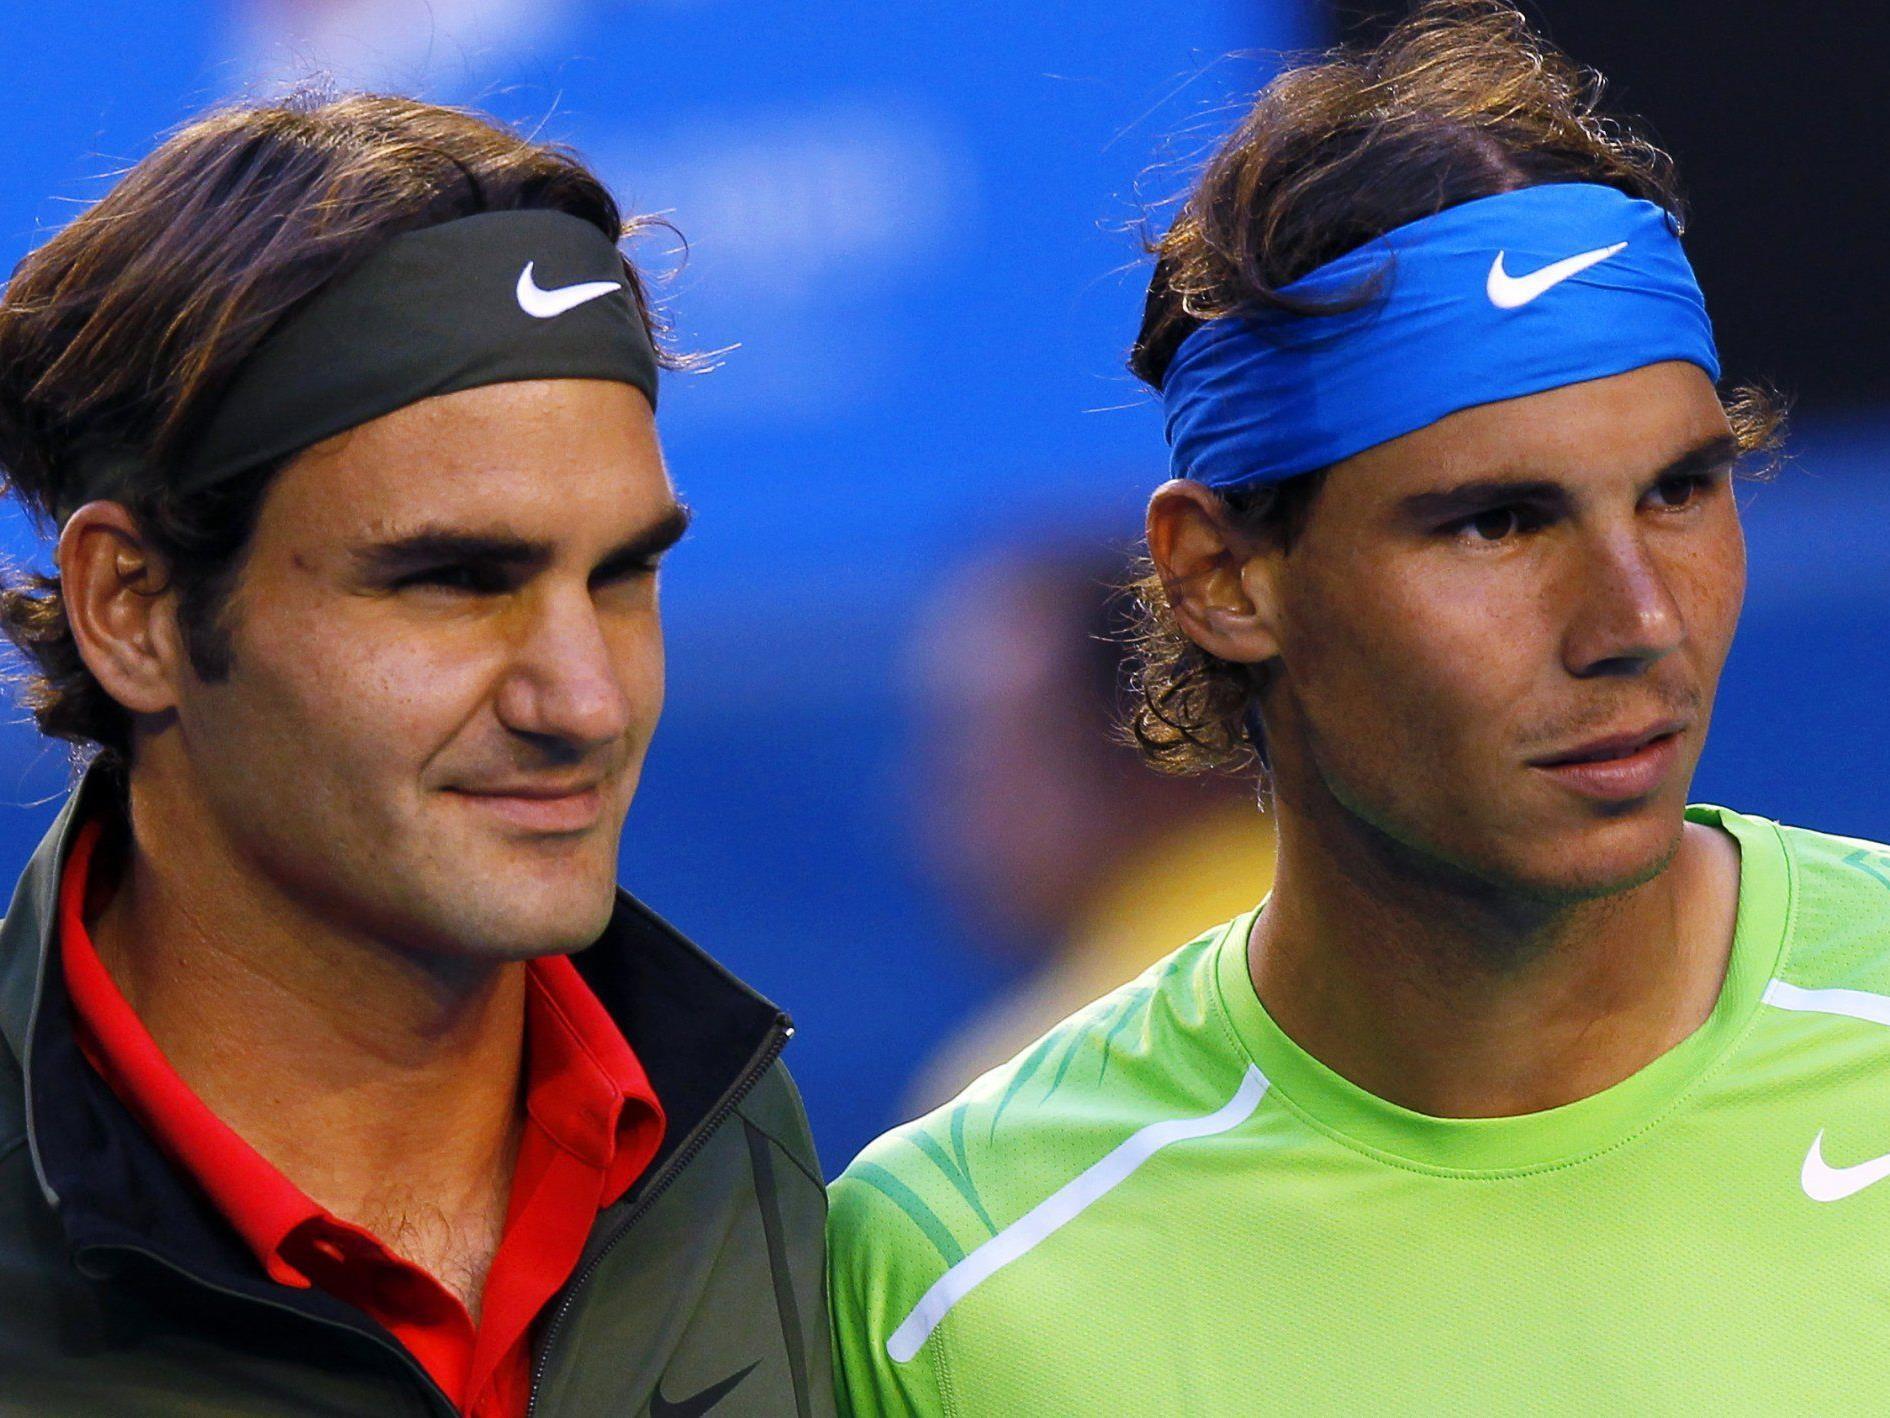 Federer und Nadal vor dem Halbfinale der Australien Open in Melbourne 2012.